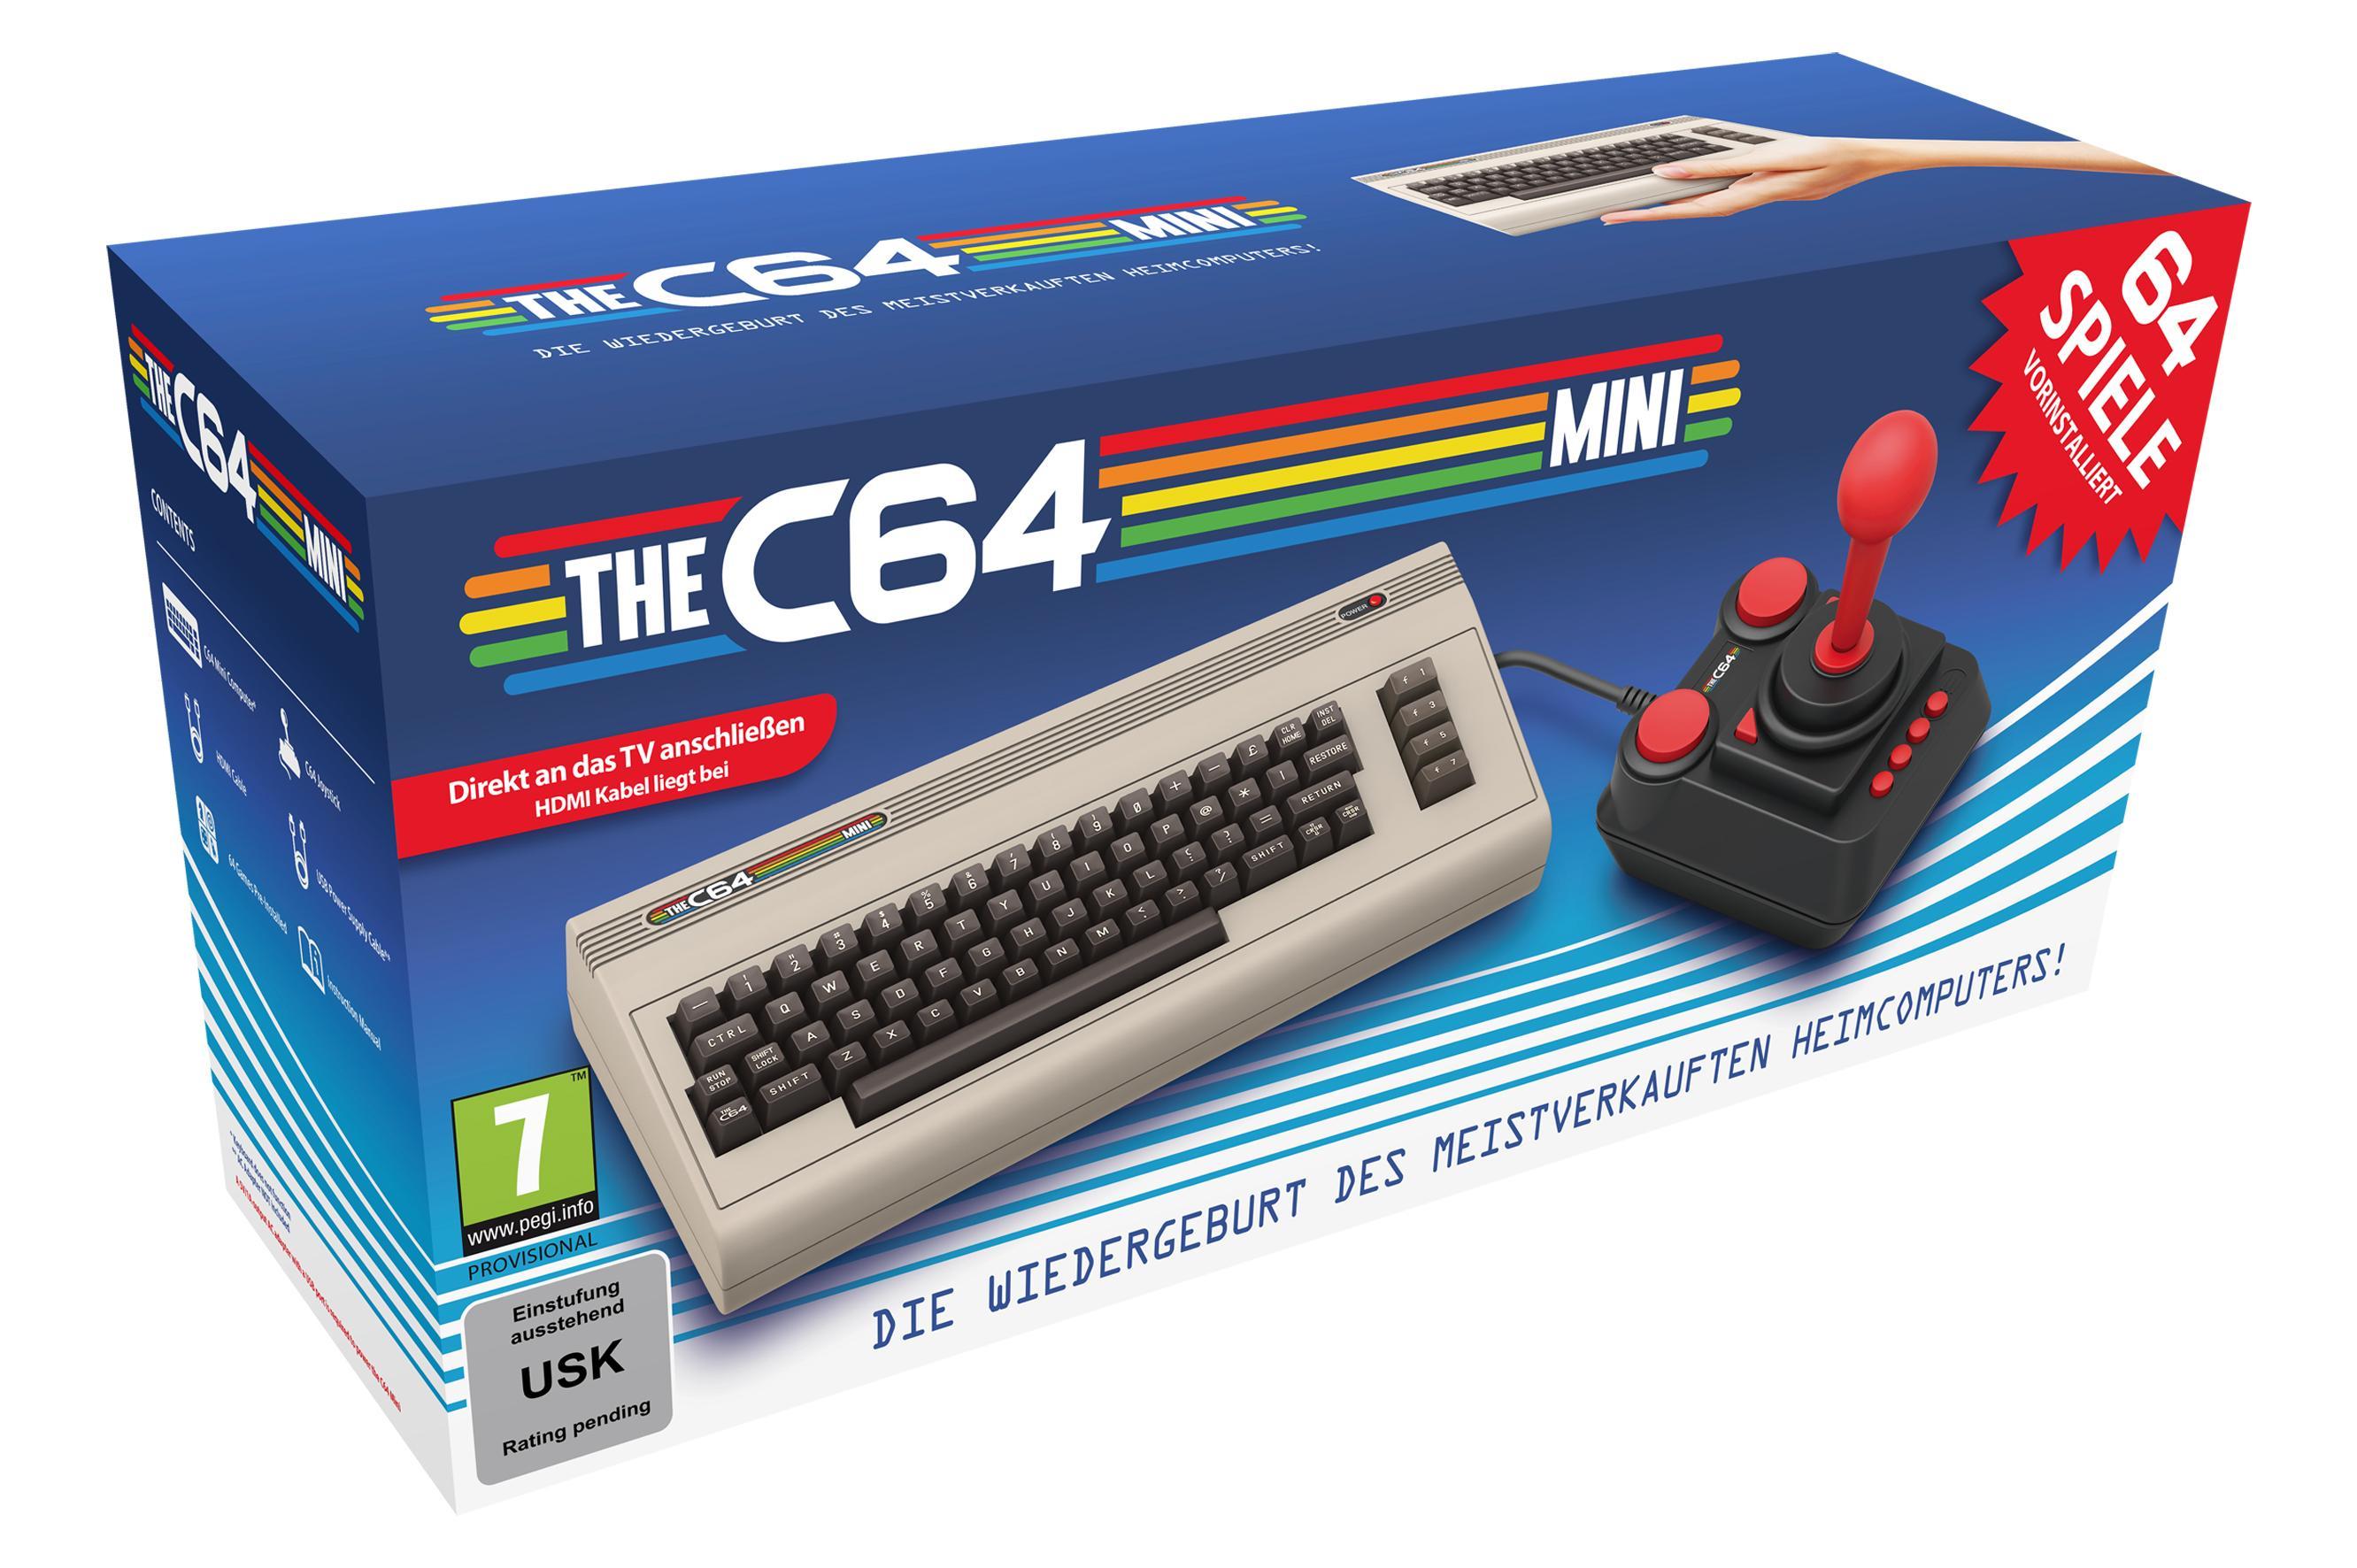 The C64 Mini für 49,99€ (Müller)